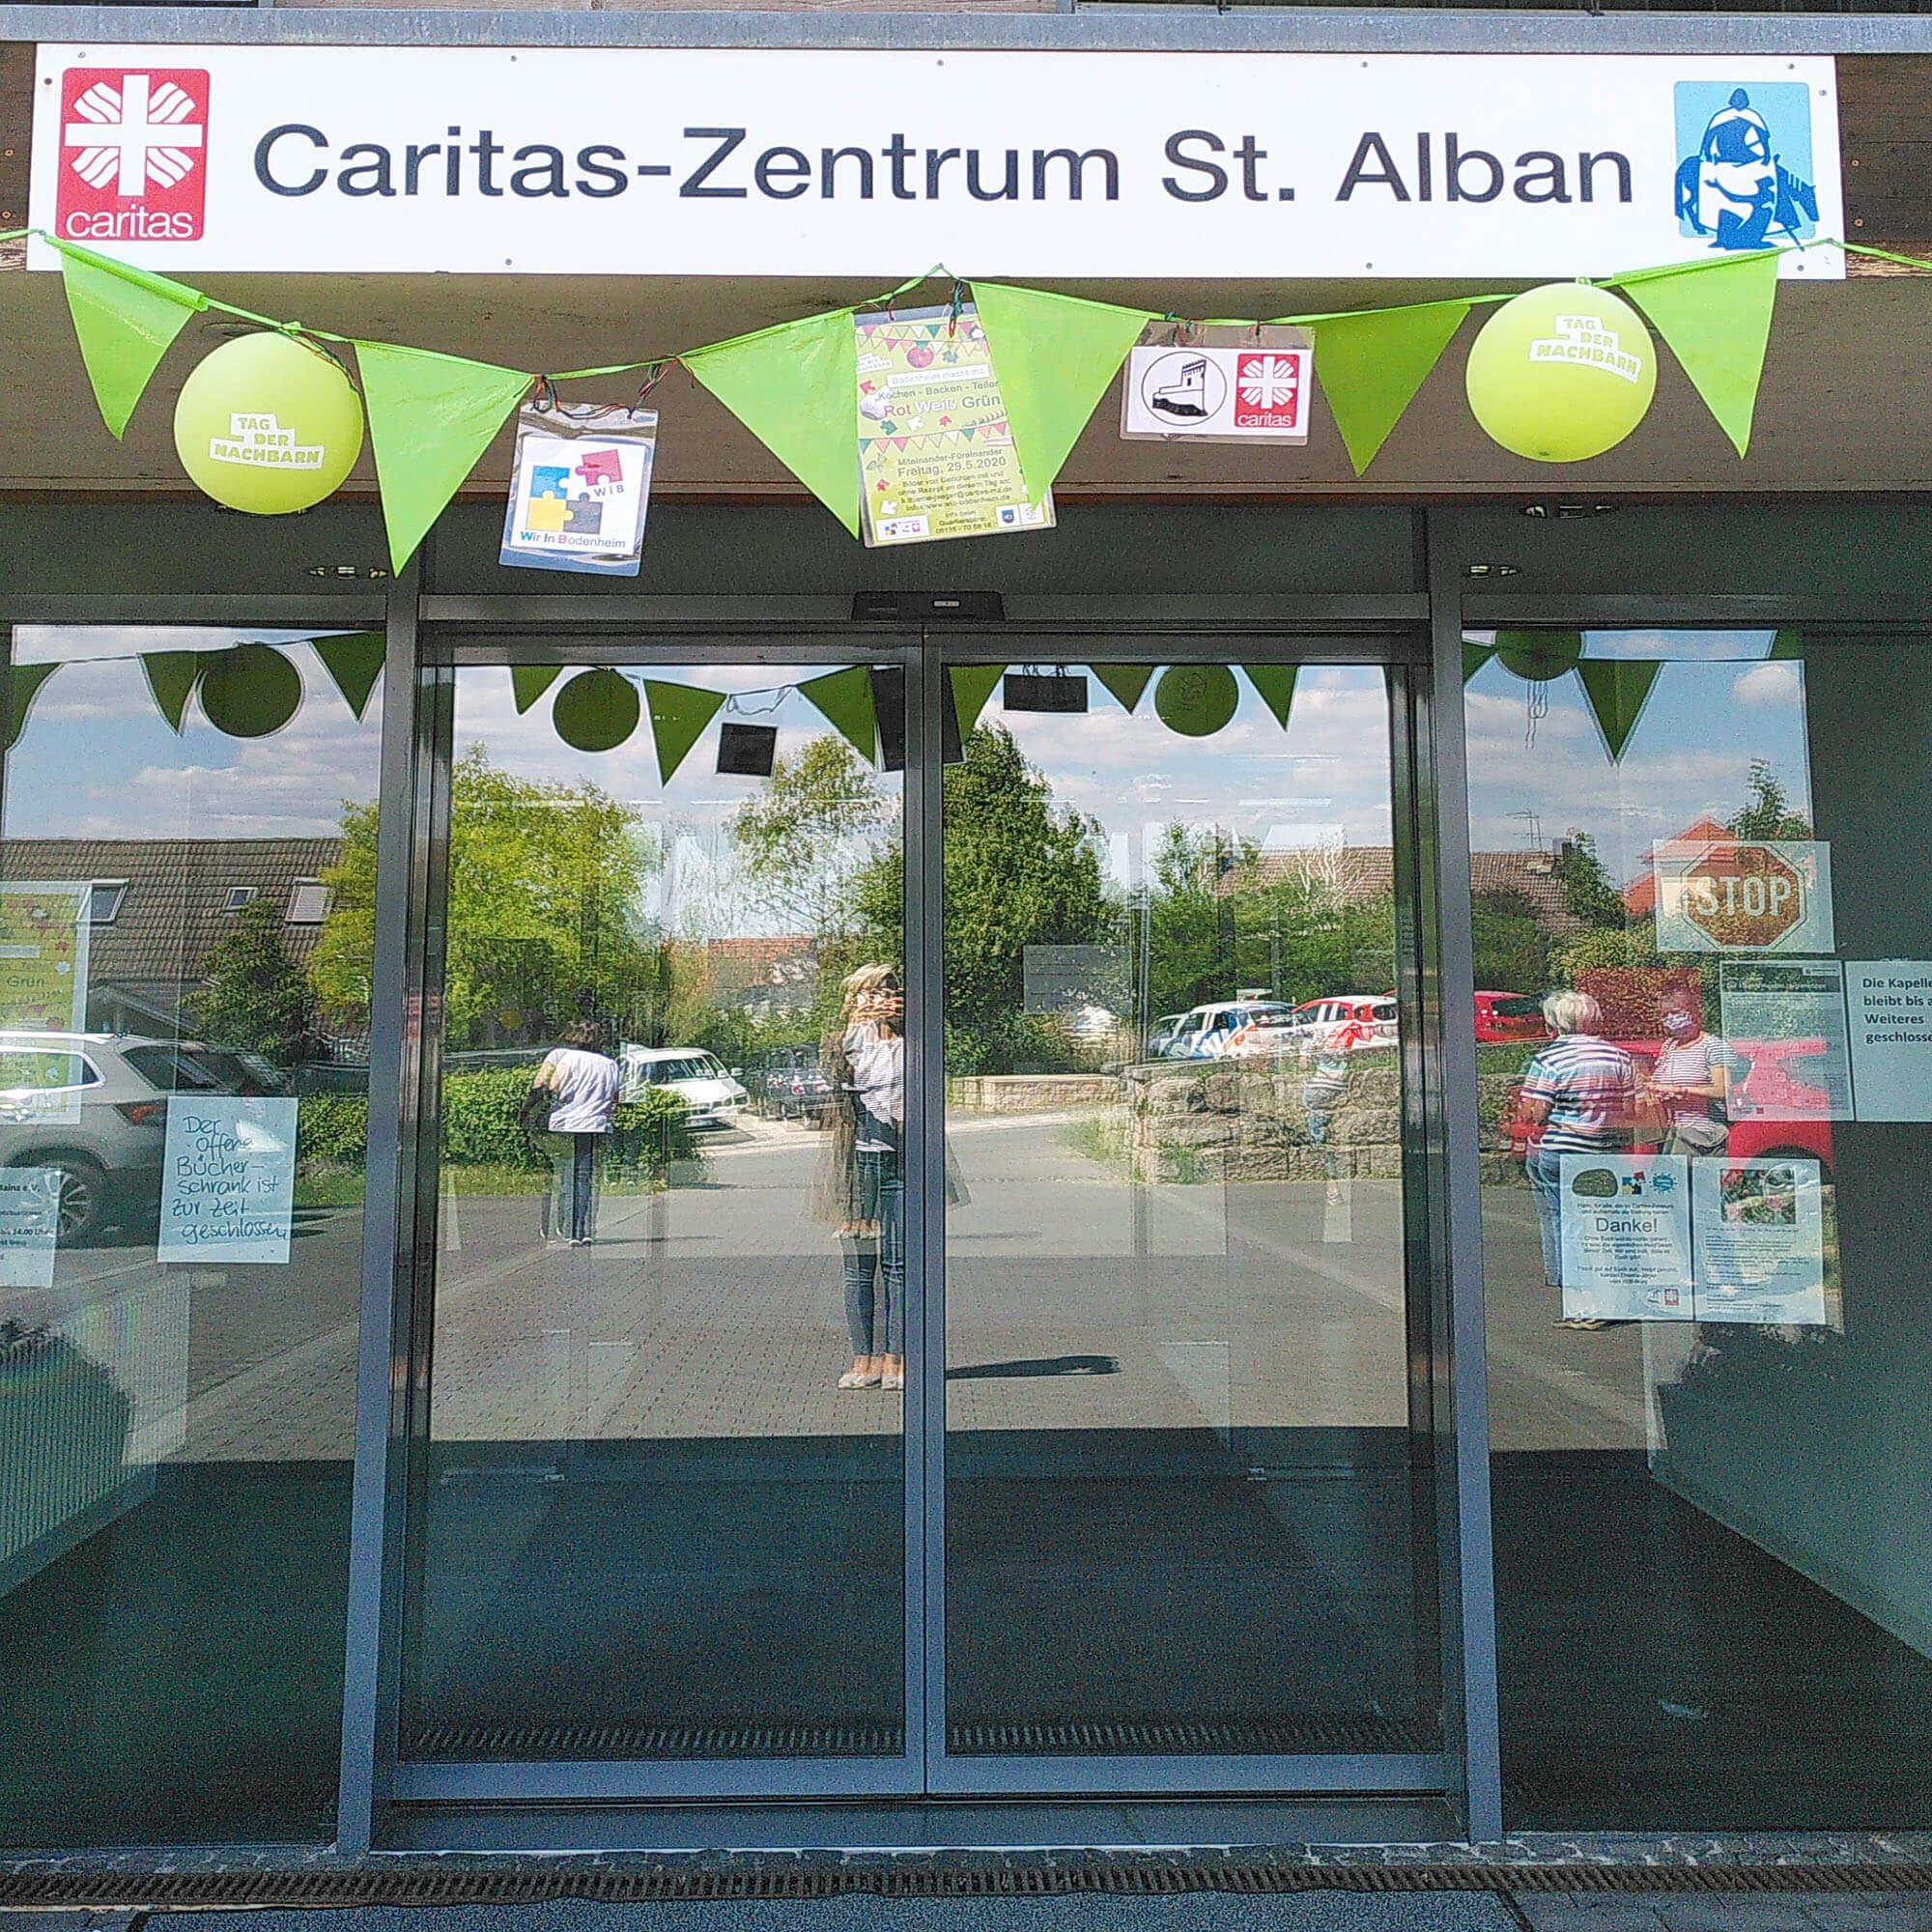 14a Caritas-Zentrum St.Alban, Girlande